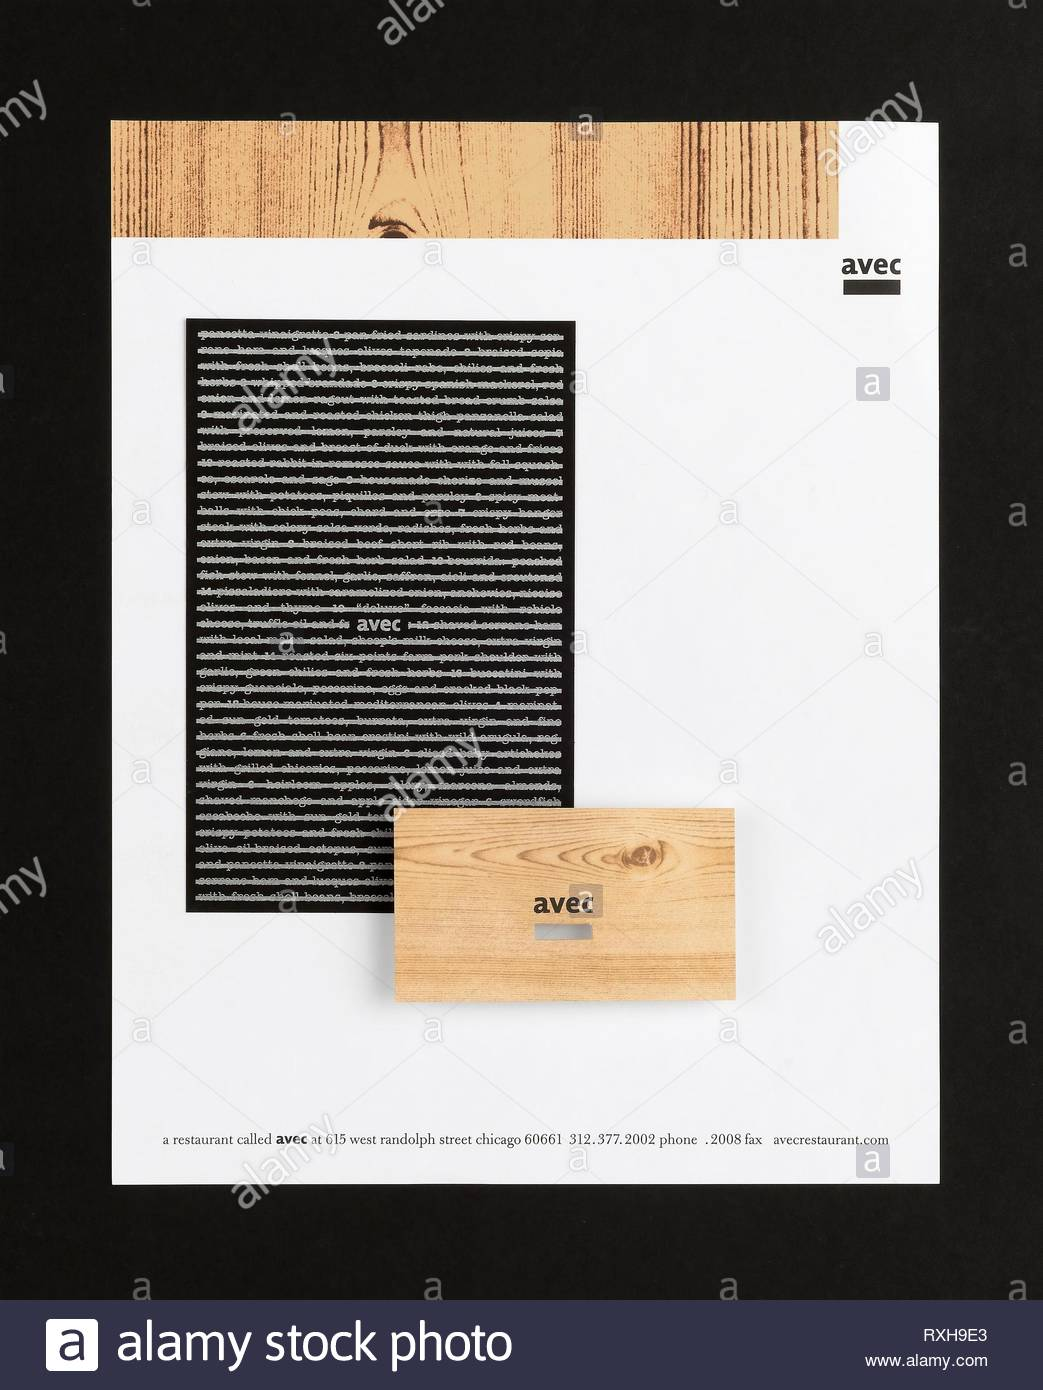 Avec. Jason Pickleman; American, born 1965. Date: 2005. Dimensions: 27.9 × 21.6 cm (11 × 8 1/2 in.). Graphic identity system: letterhead, paper. Origin: United States. Museum: The Chicago Art Institute. - Stock Image